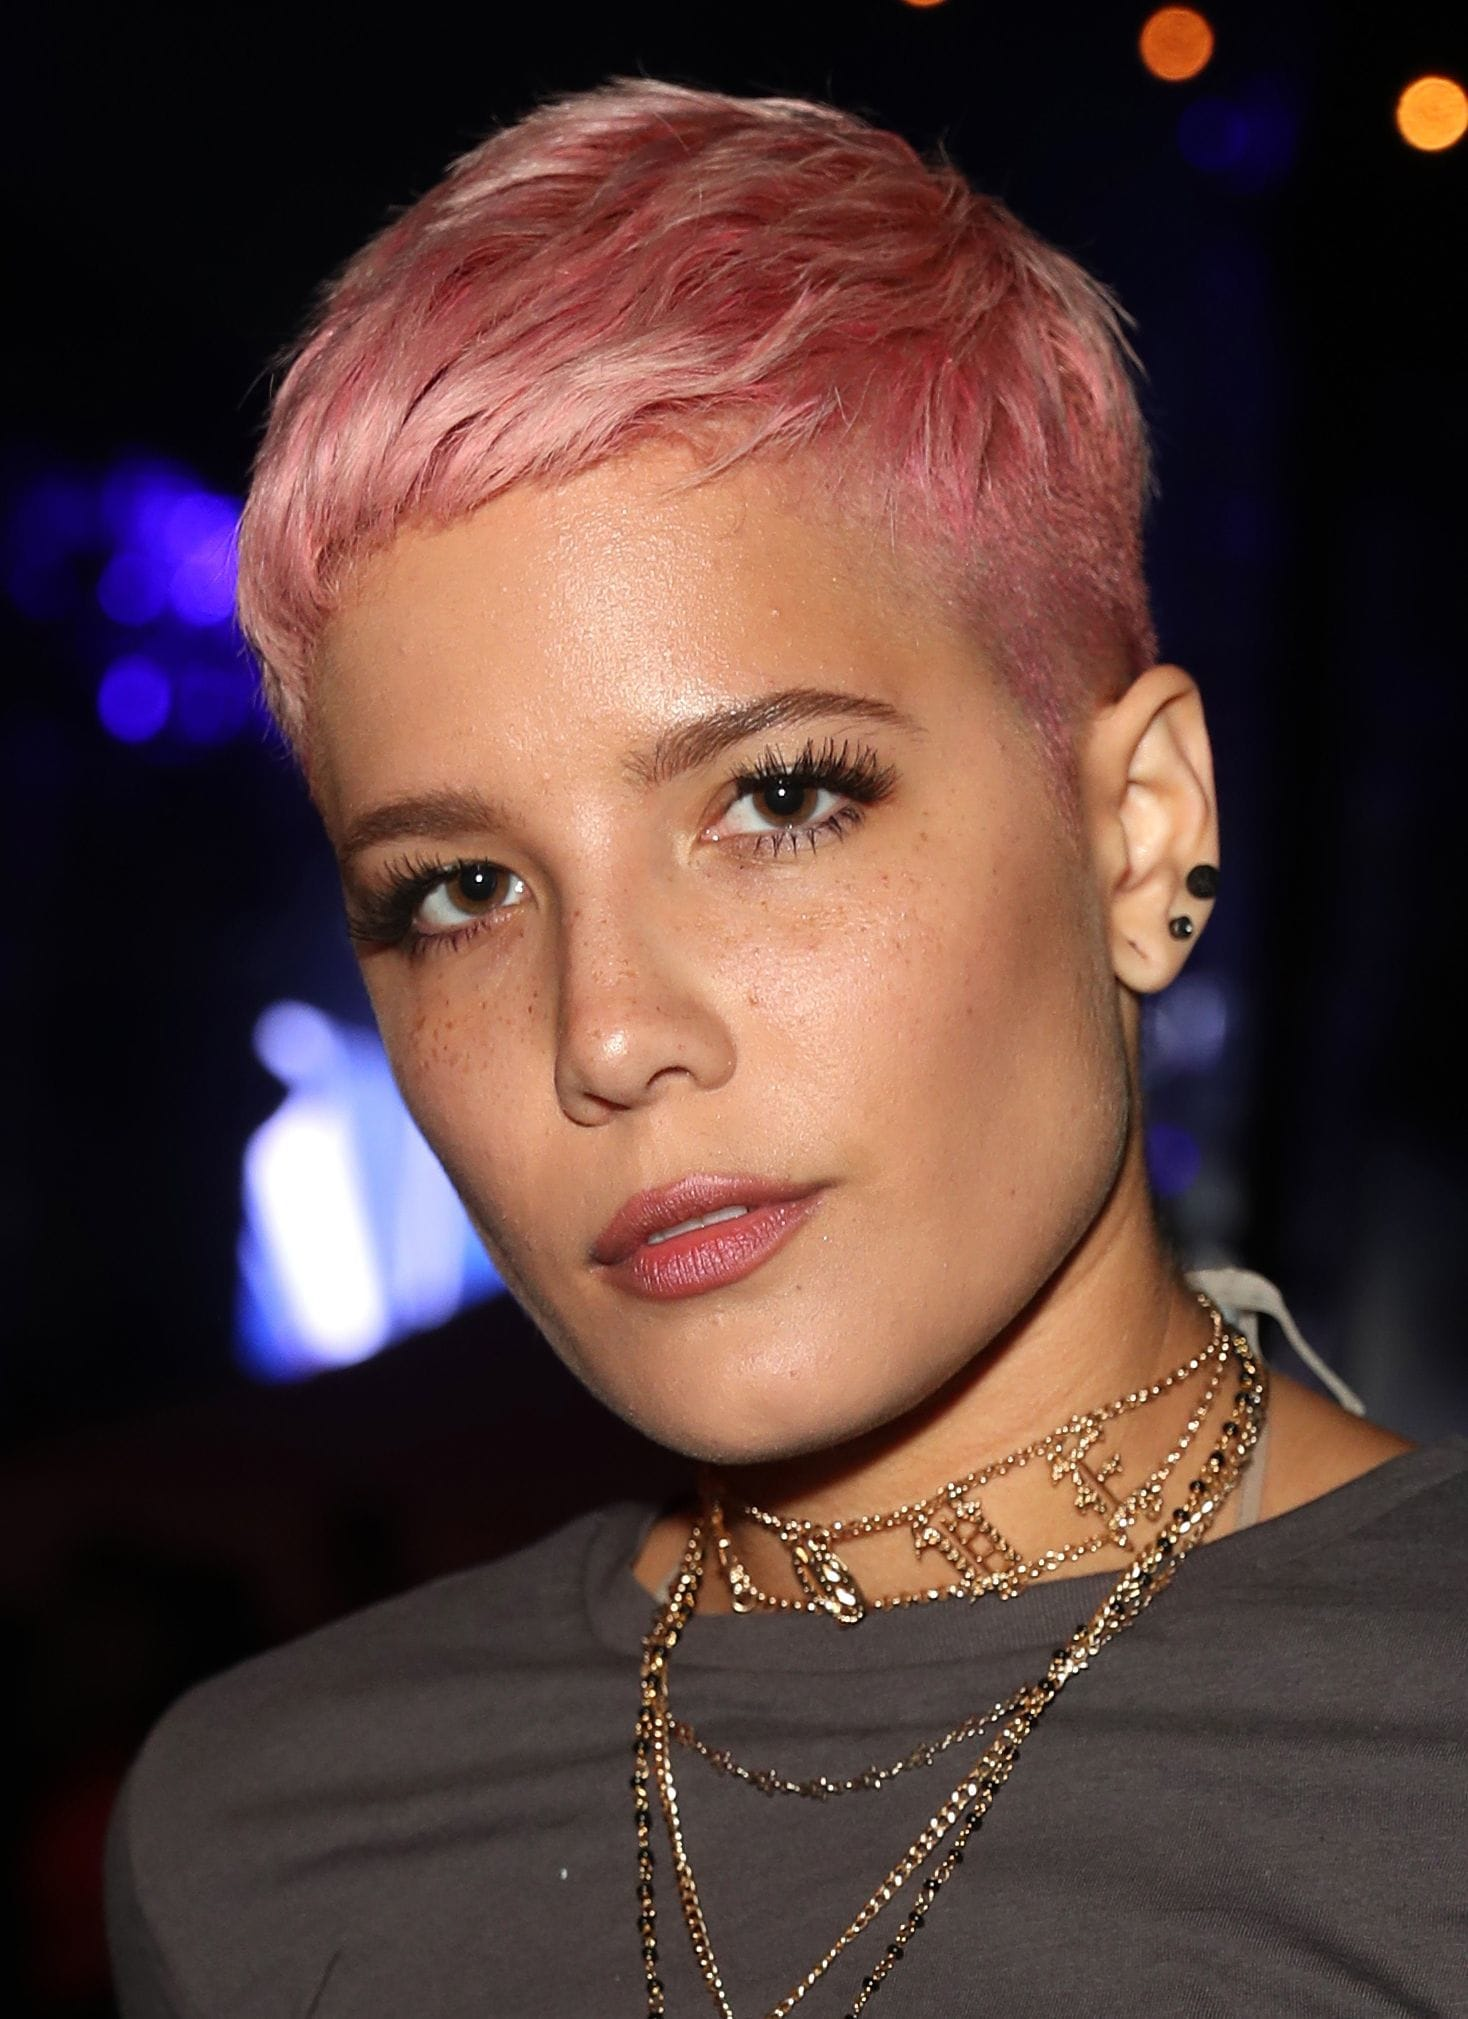 Halsey - bright pink pixie cut - 2017 - Rex